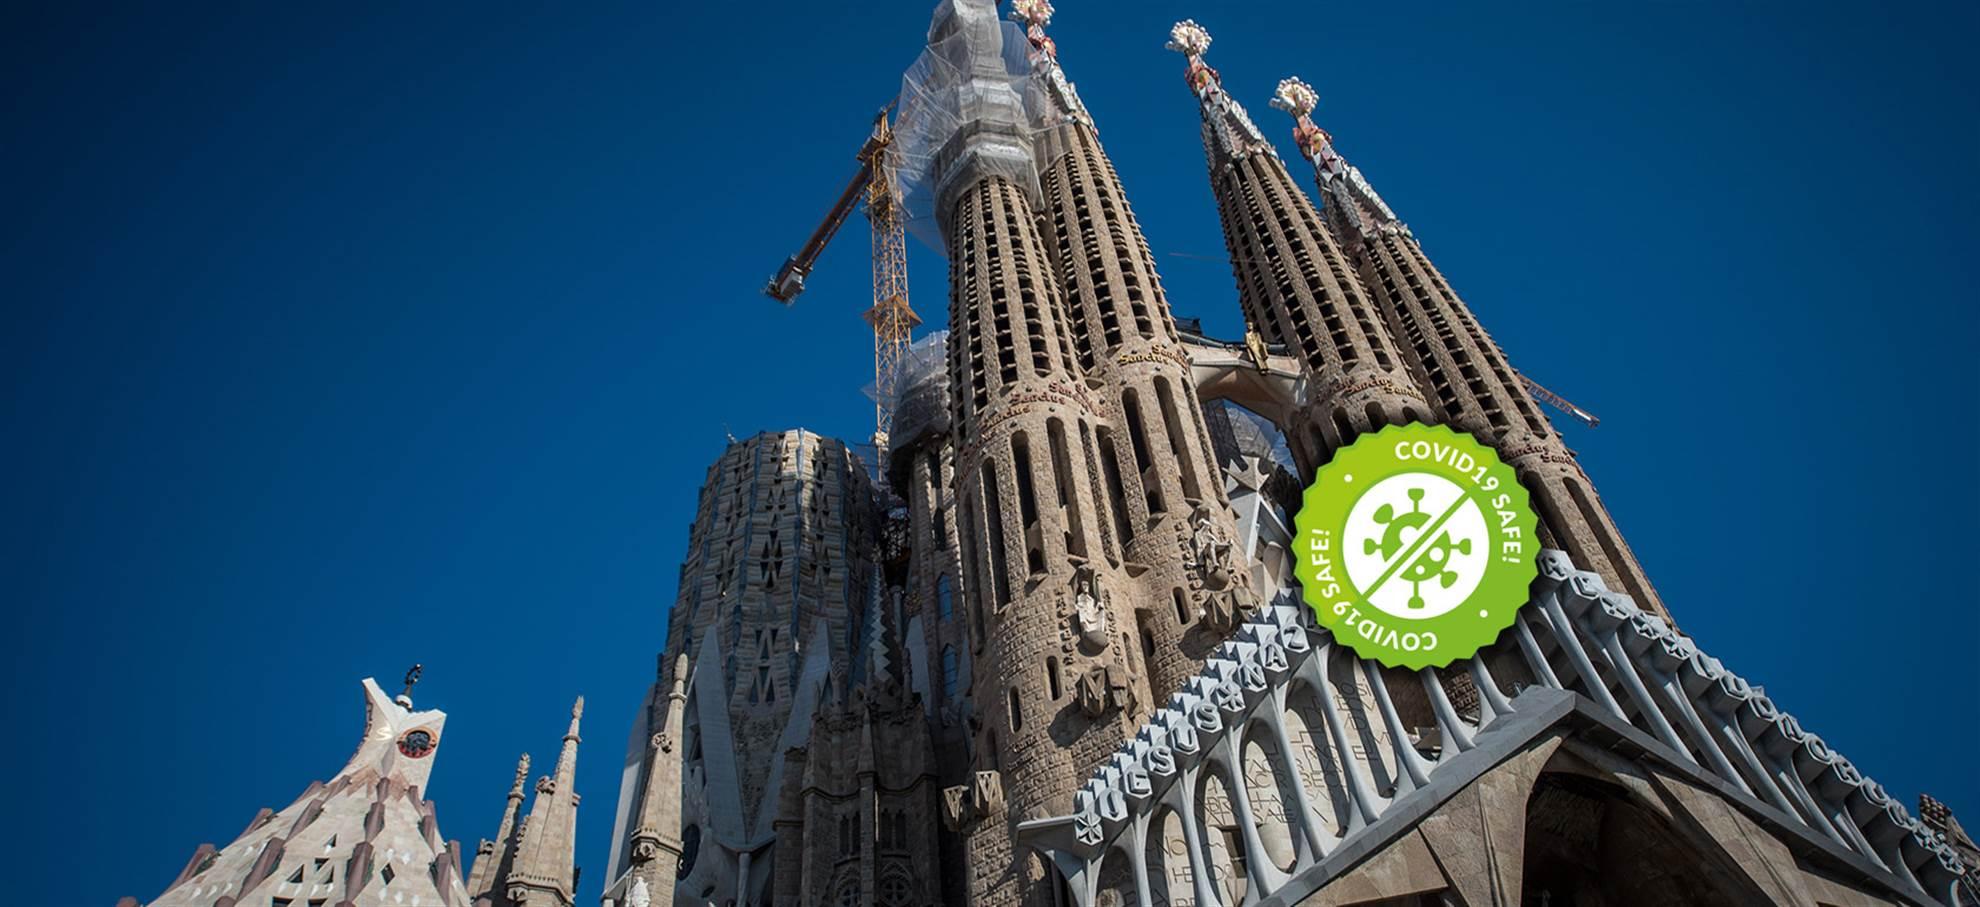 La Sagrada Familia ''Tour des façades